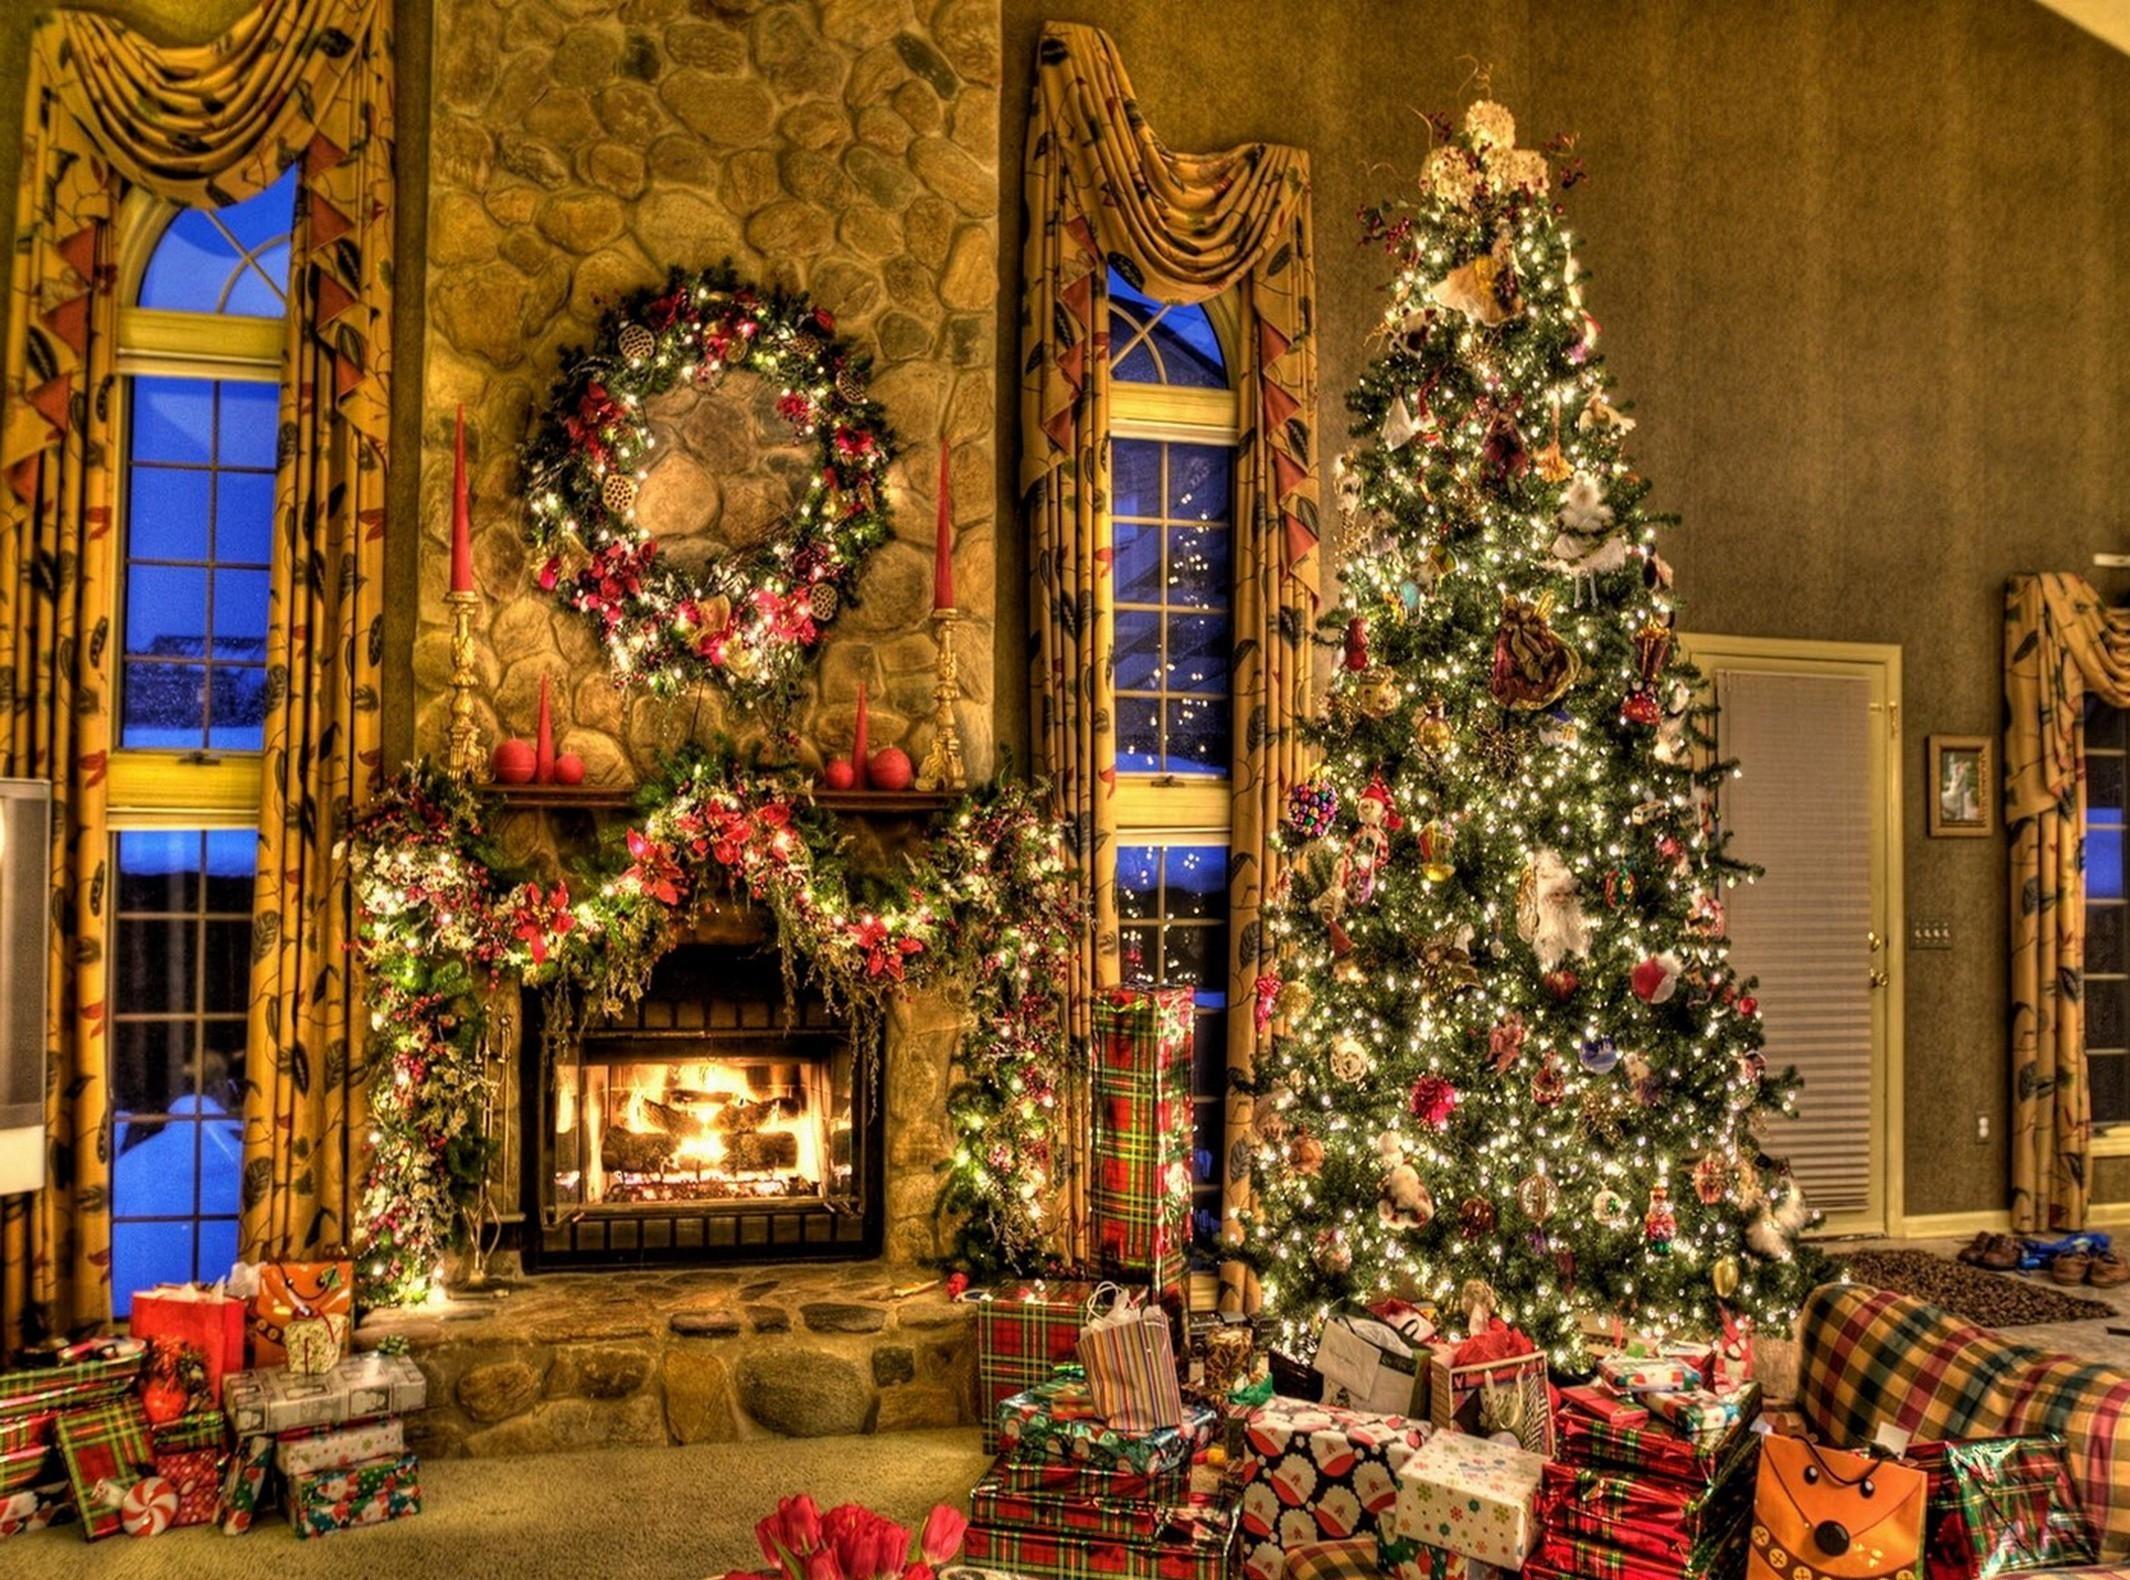 Christmas Tree Fireplace  free christmas fireplace wallpaper 2017 Grasscloth Wallpaper